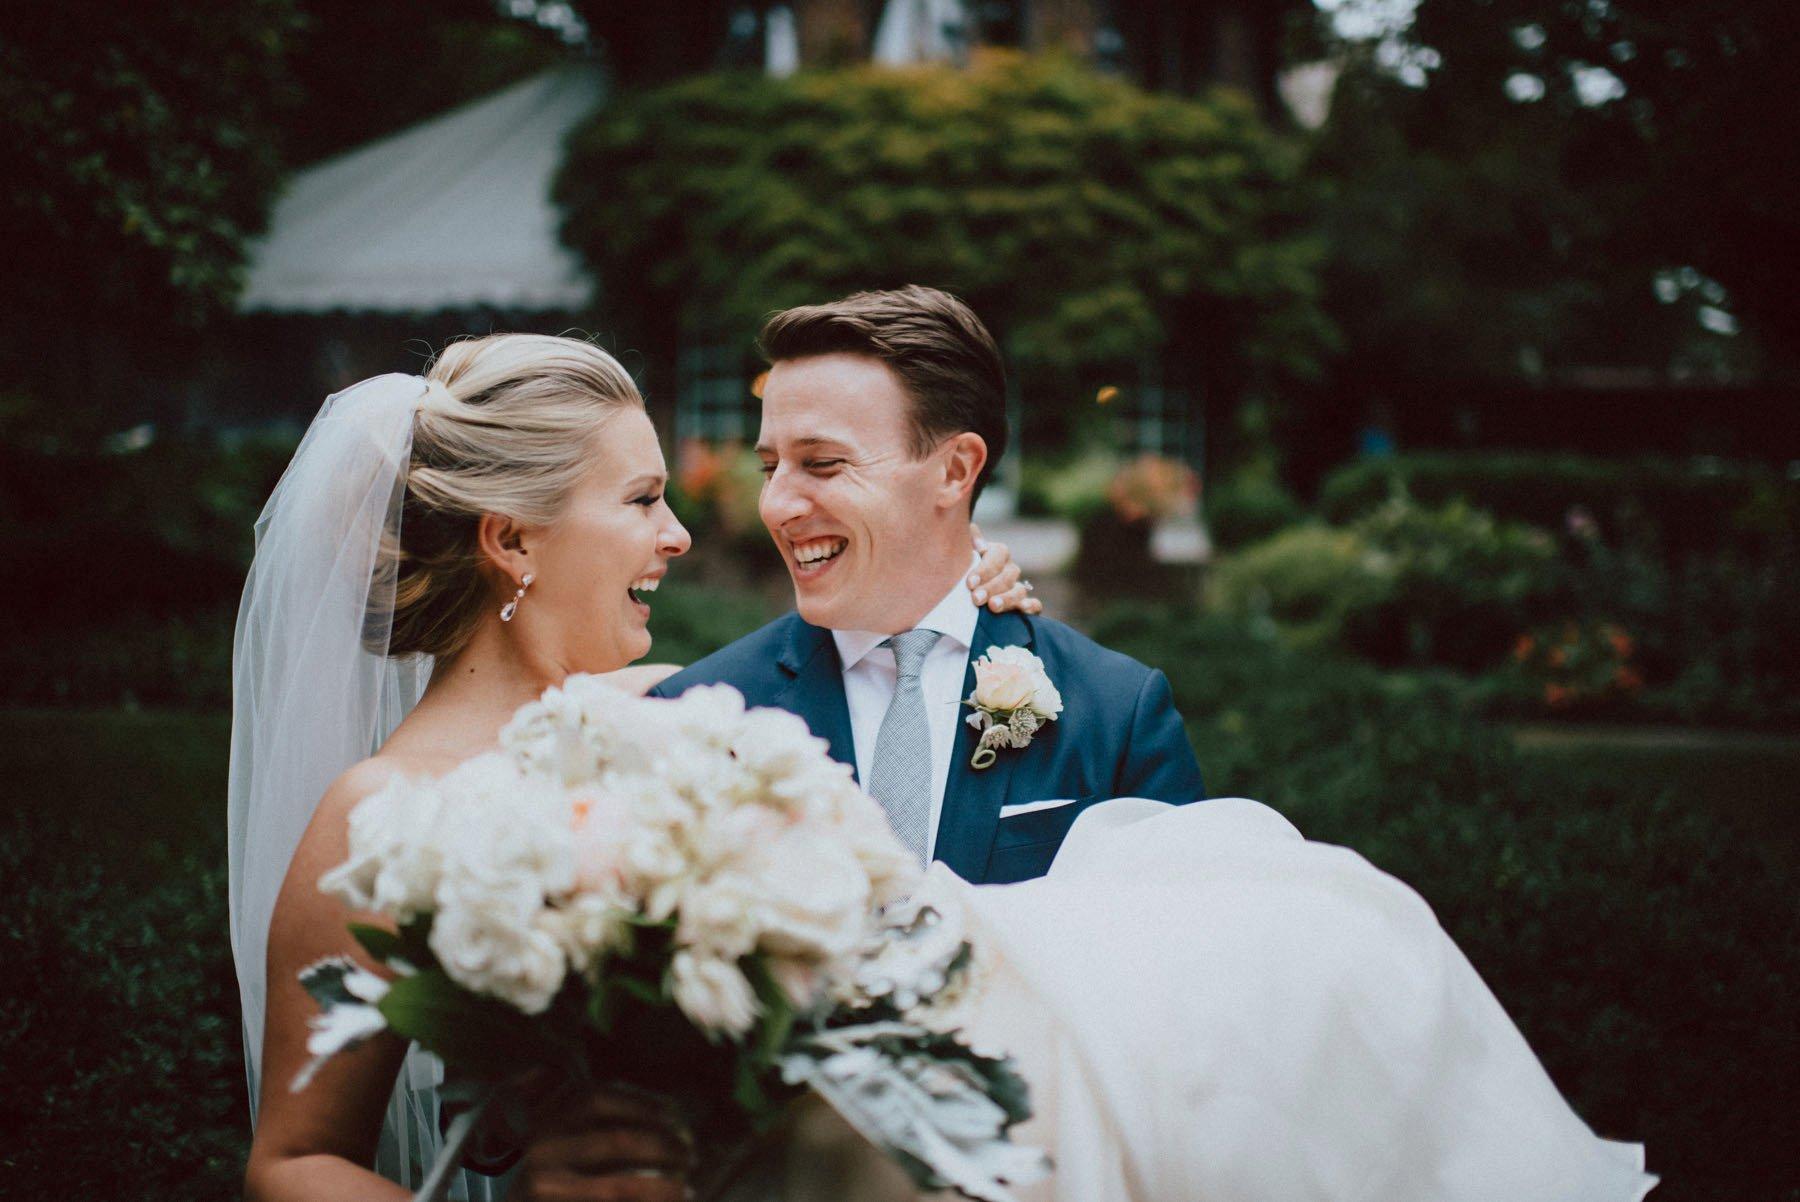 greenville-country-club-wedding-71.jpg